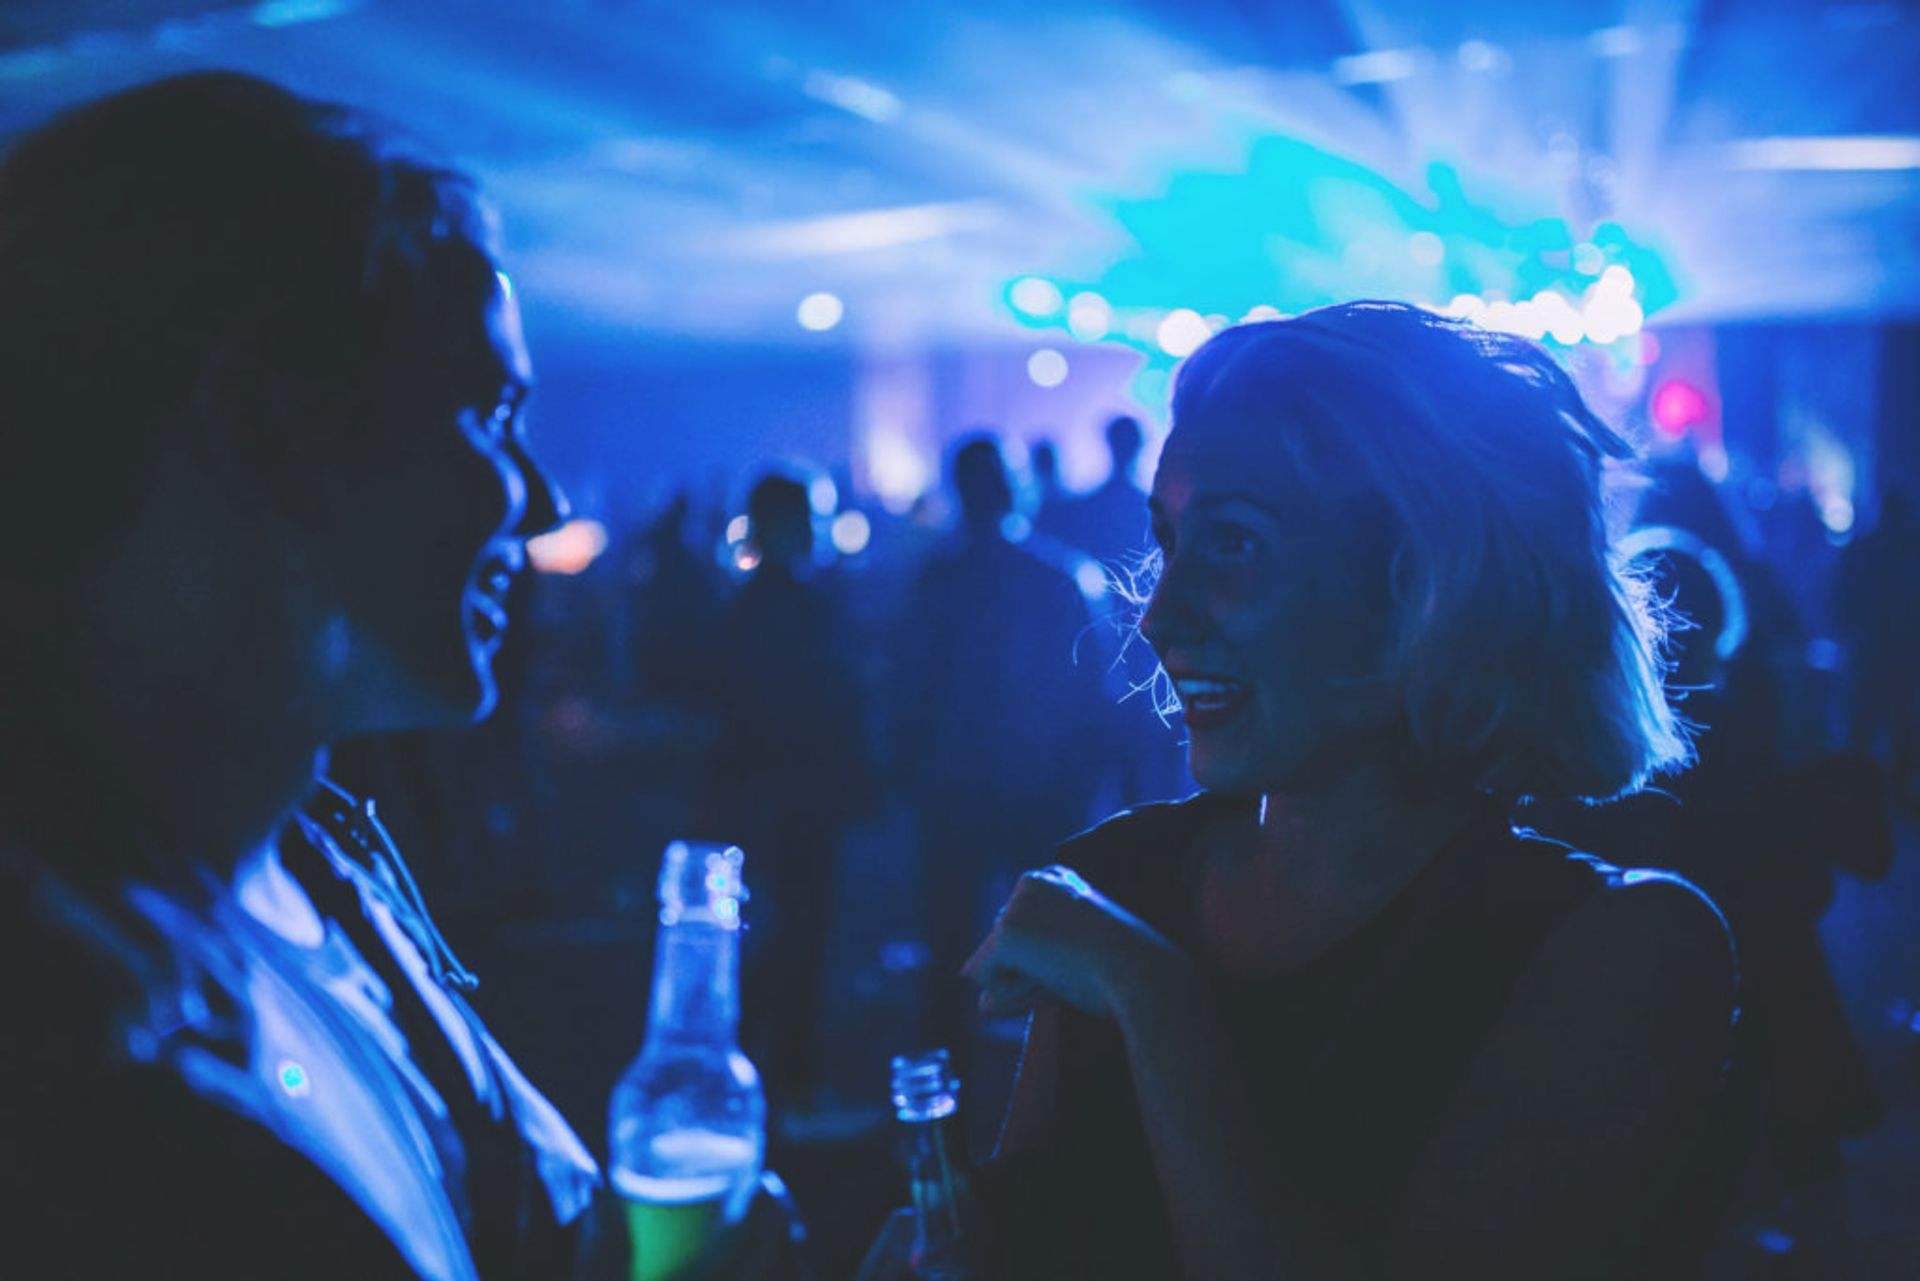 People at a nightclub.